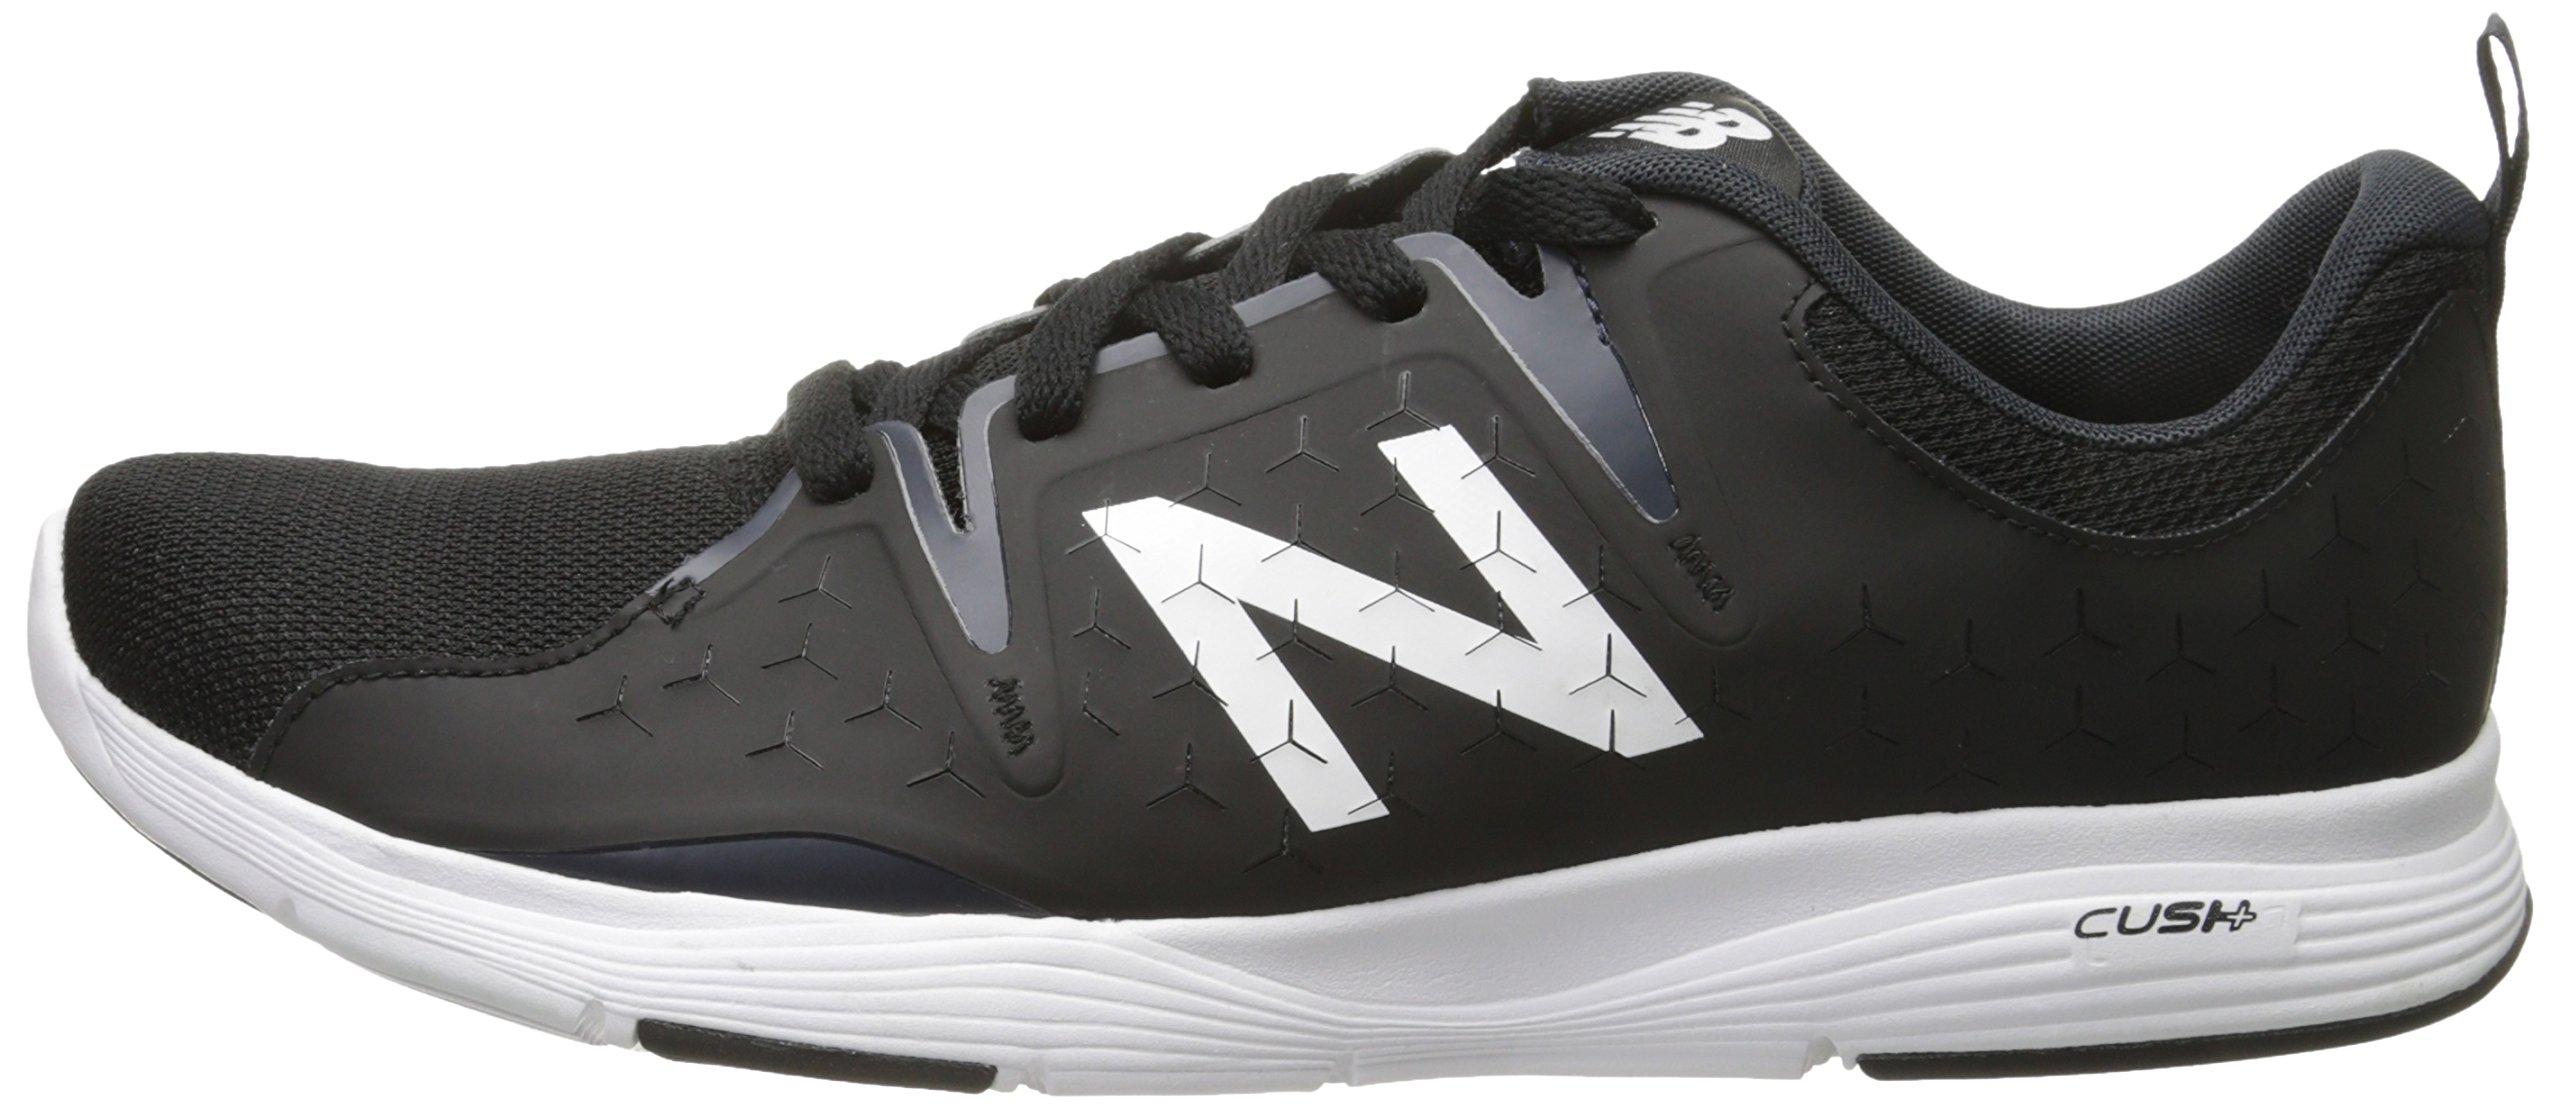 New Balance 818 Trainer - 45